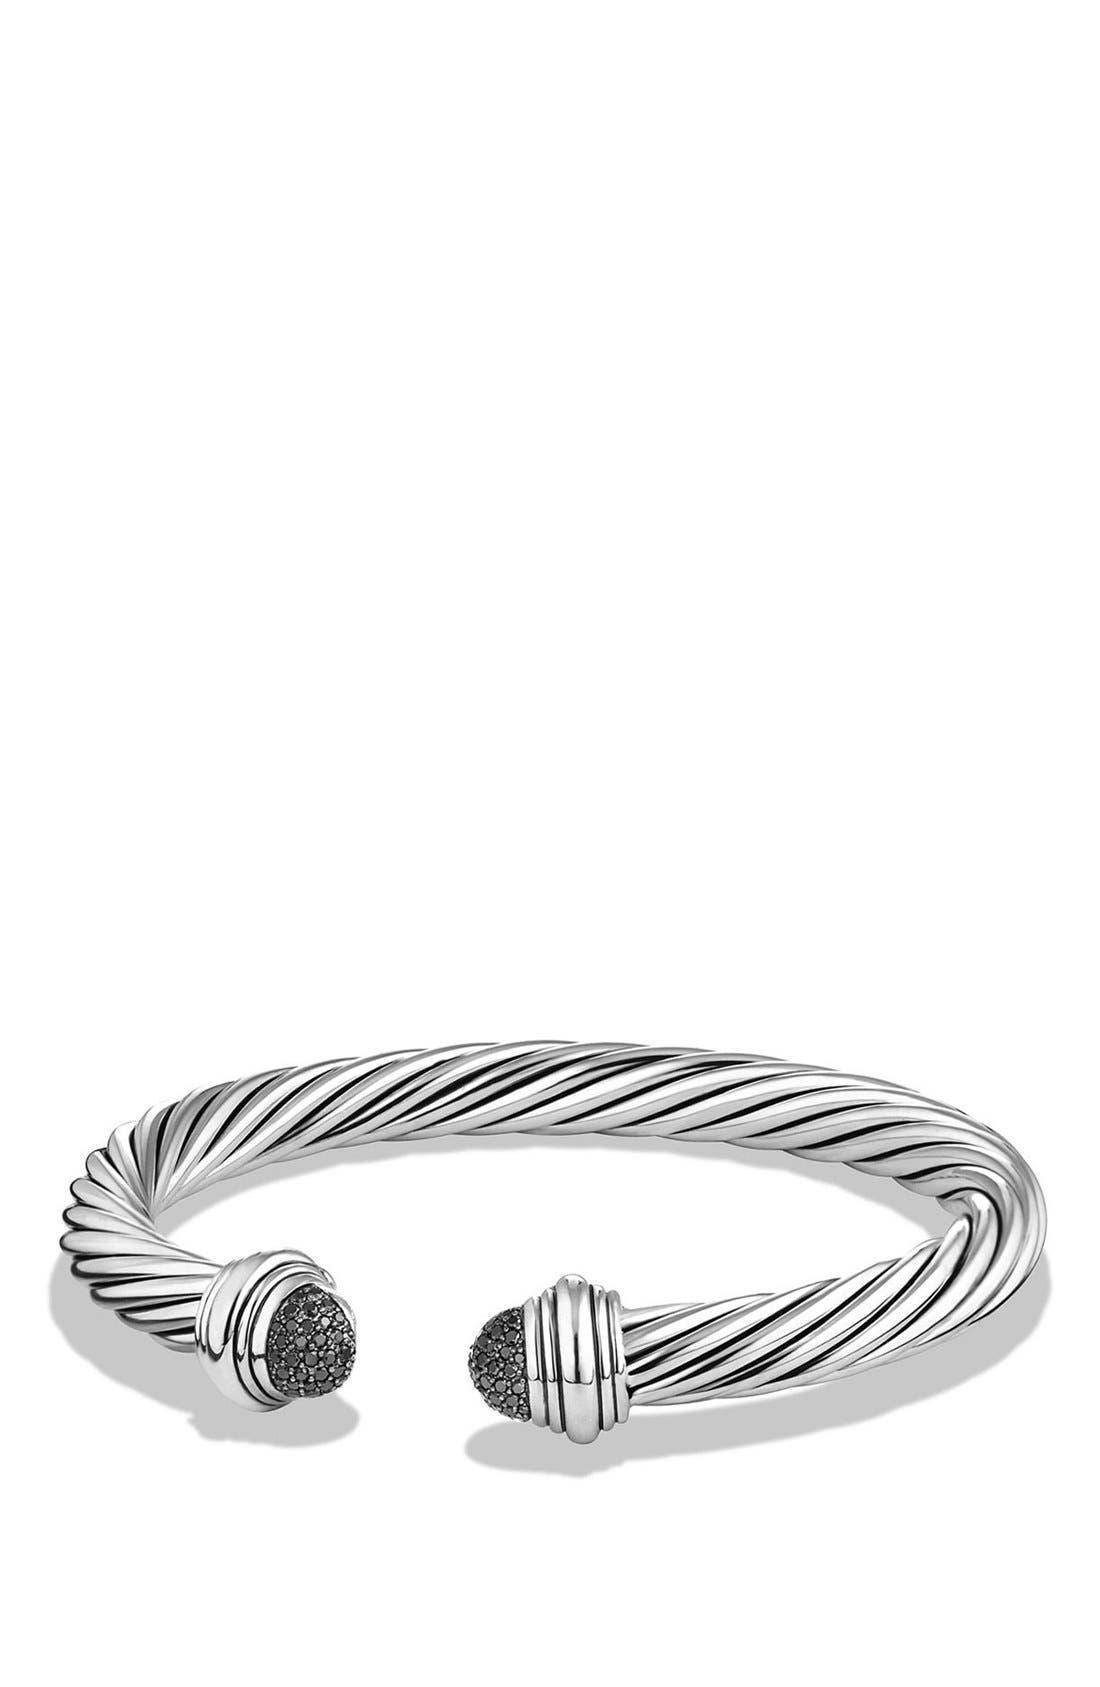 Alternate Image 1 Selected - David Yurman 'Cable Classics' Bracelet with Black Diamonds